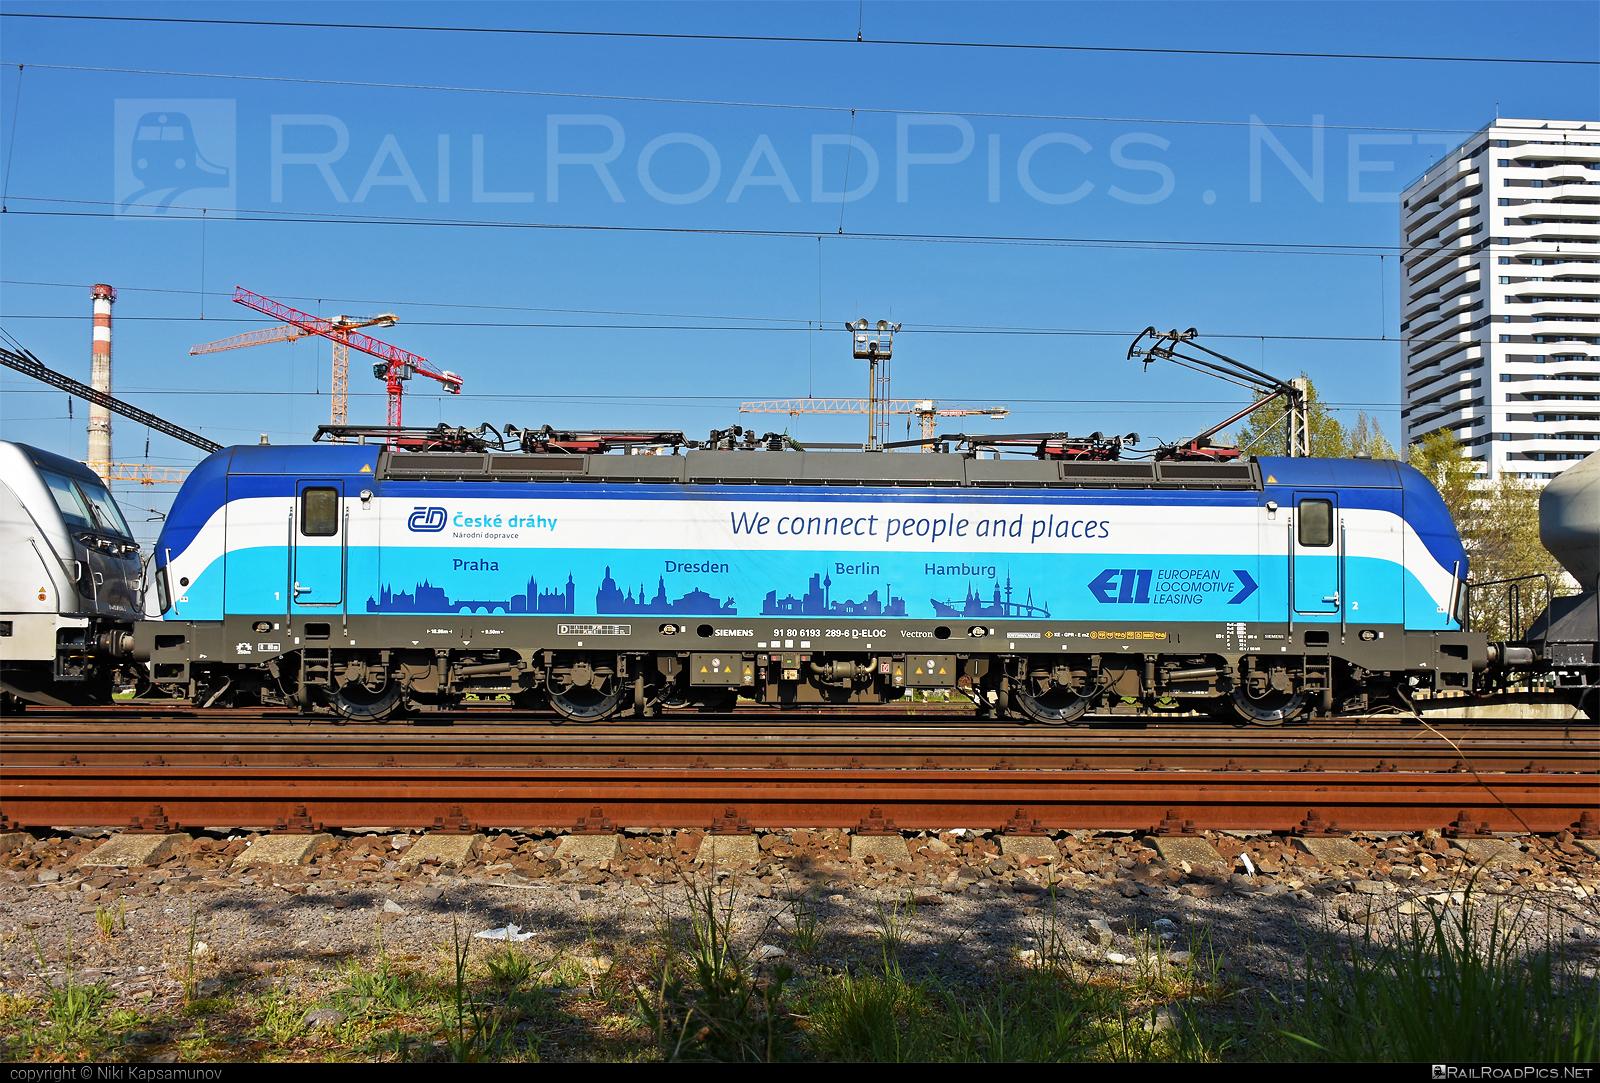 Siemens Vectron MS - 193 289-6 operated by ČD Cargo, a.s. #cdcargo #cdcargoniederlassungwien #ell #ellgermany #eloc #europeanlocomotiveleasing #siemens #siemensvectron #siemensvectronms #vectron #vectronms